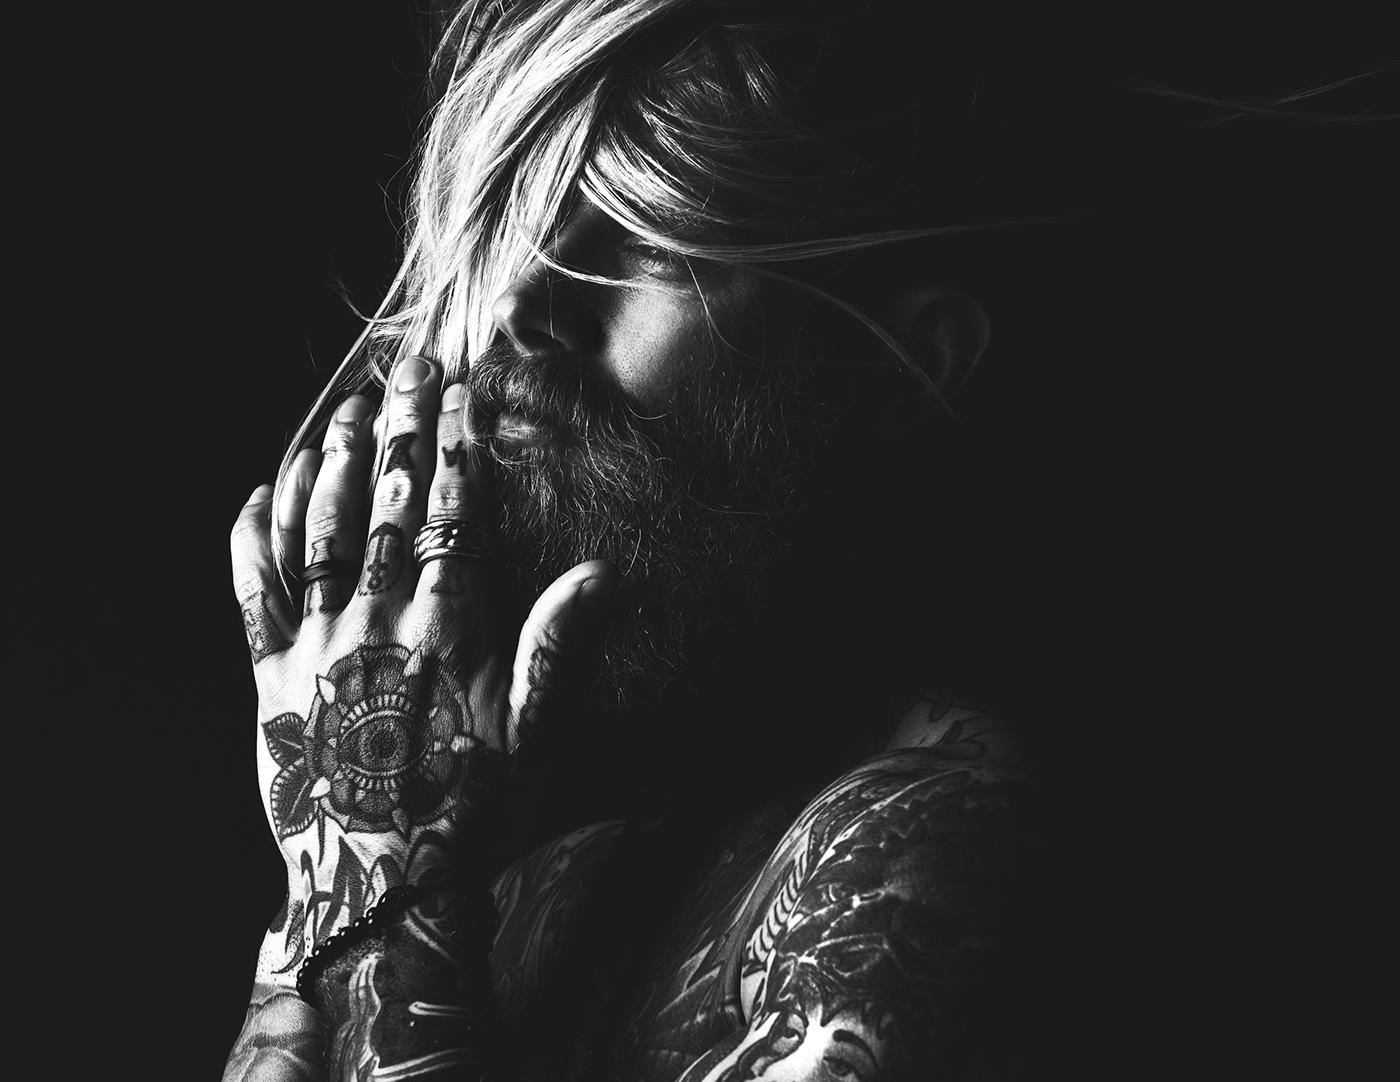 tattoo ink beard dark epic hands gothic portrait edgy viking